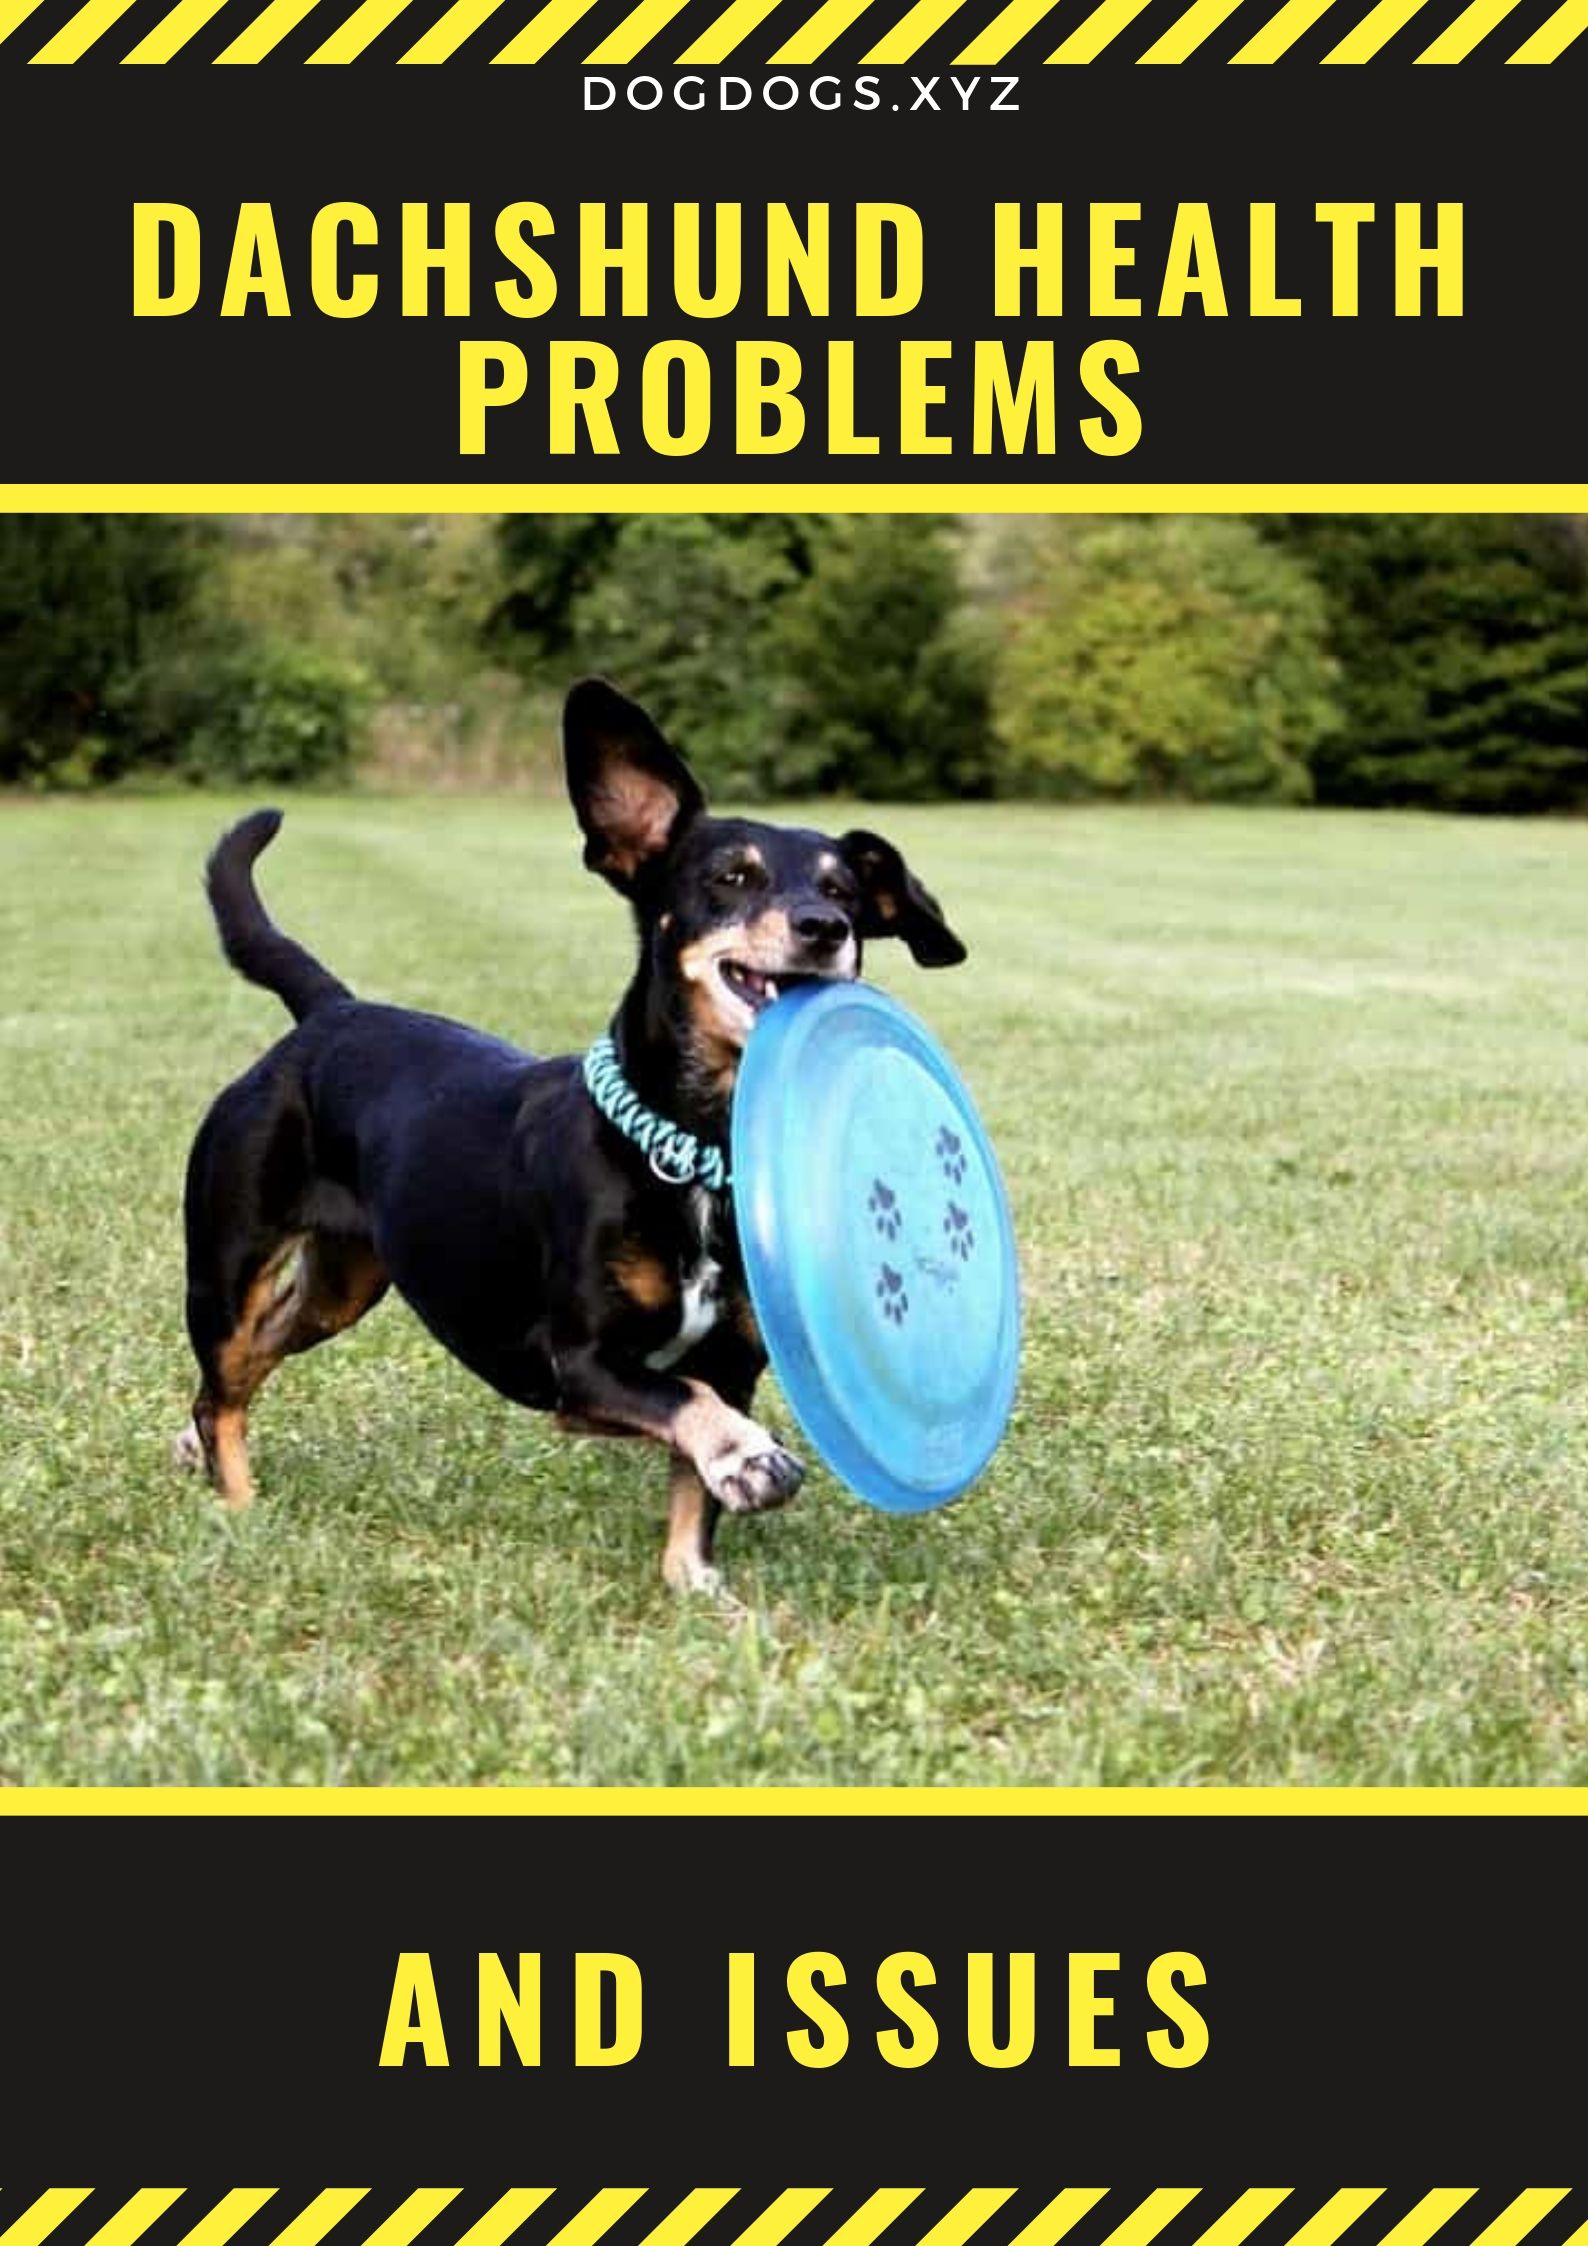 Dachshund Health Problems Issues Dog Health Dachshund